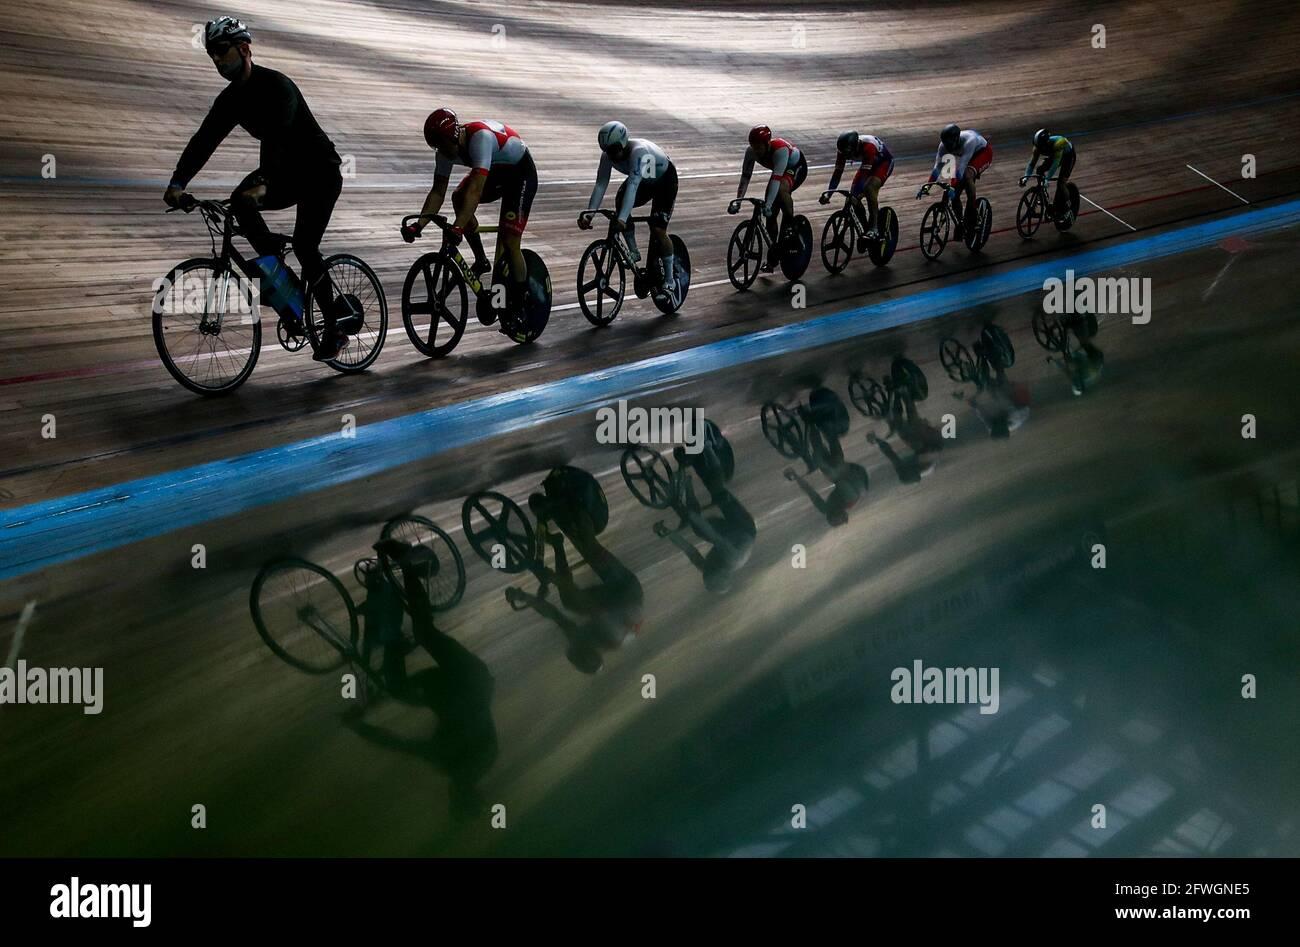 Moskau, Russland. Mai 2021. Teilnehmer am Grand Prix of Moscow Track Cycling Event 2021 im Krylatskoye Velodrome. Kredit: Sergei Bobylev/TASS/Alamy Live Nachrichten Stockfoto